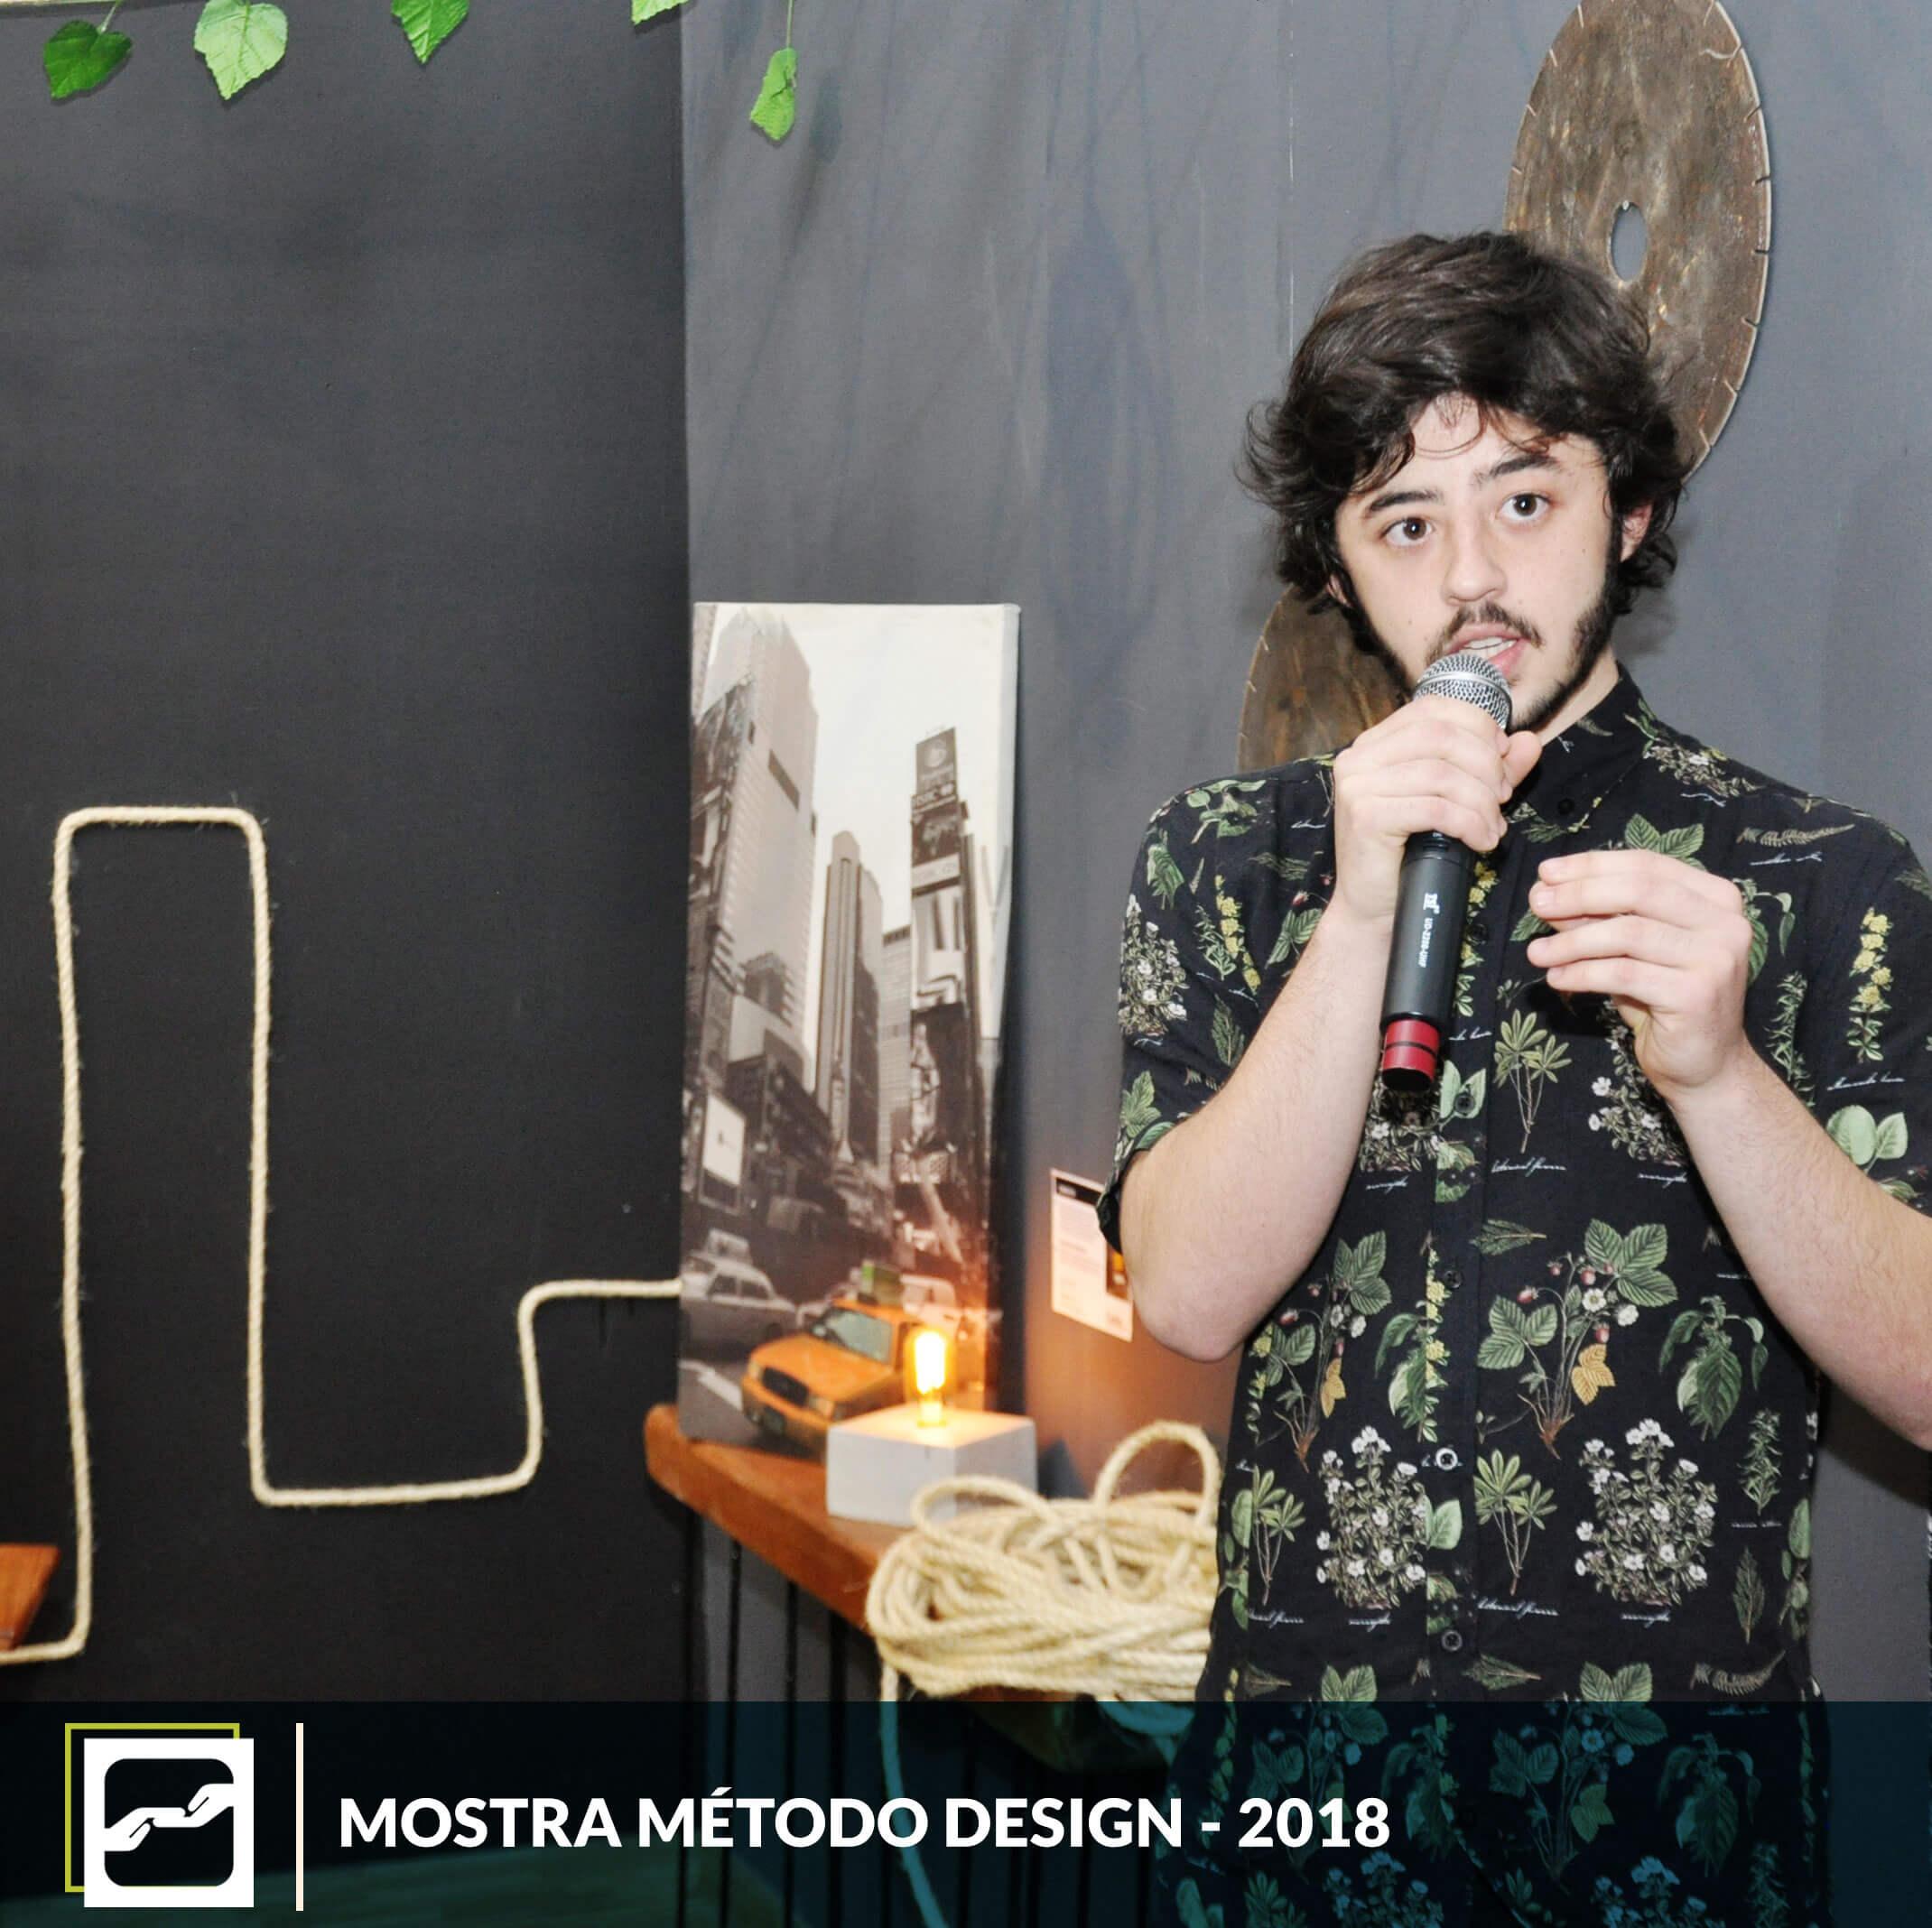 mostra-metodo-design-interiores-famesp